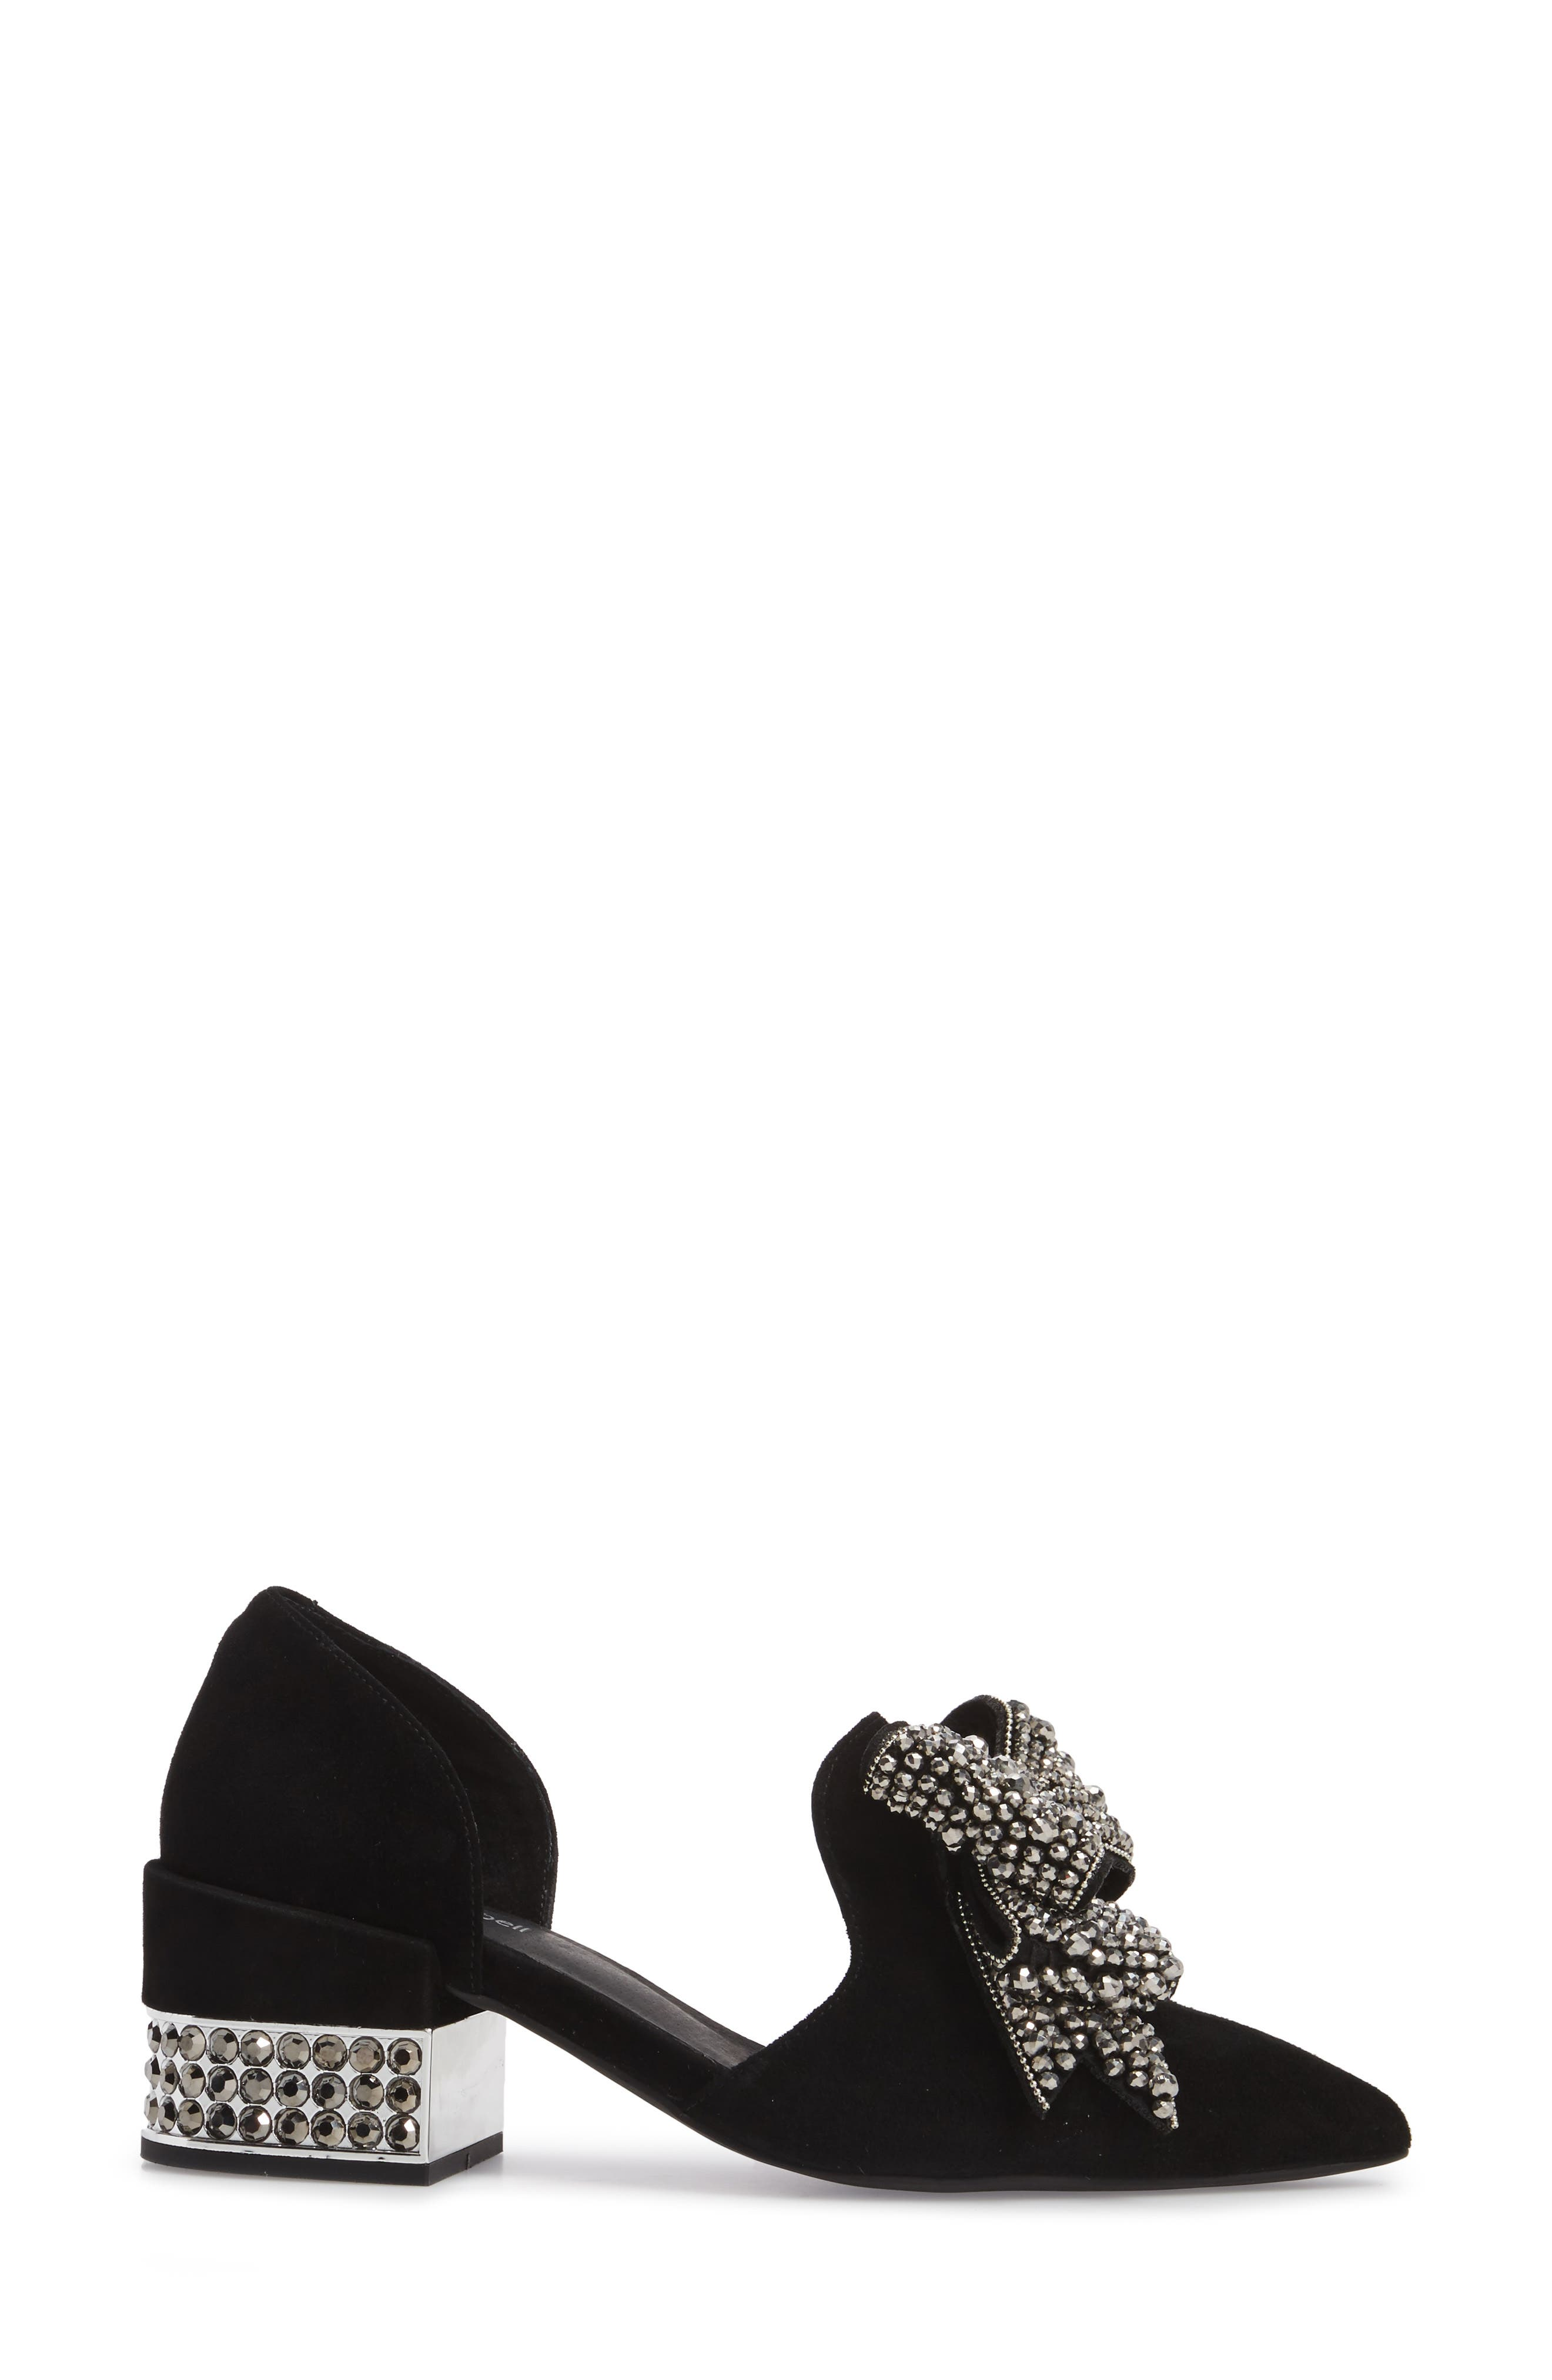 Alternate Image 3  - Jeffrey Campbell Valenti Embellished Bow Loafer (Women)